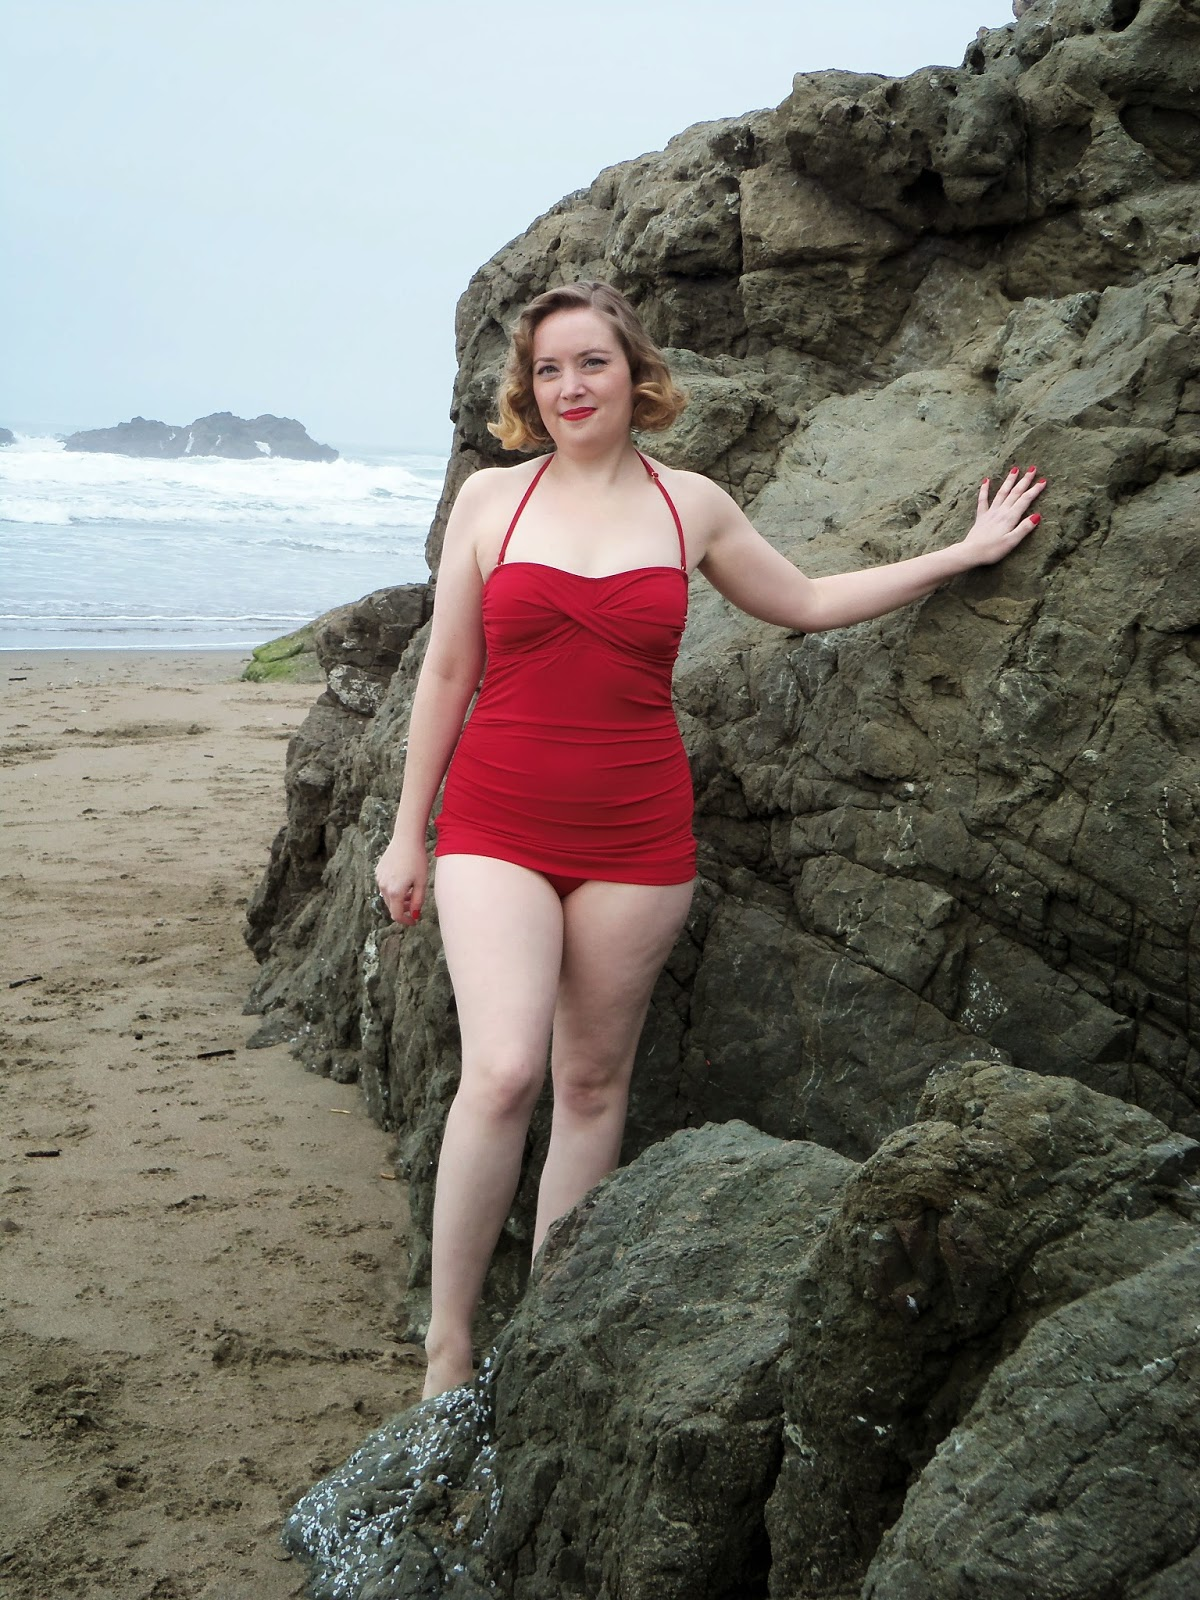 http://www.popinaswimwear.com/jantzen-vamp-maillot-bathing-suit-swimwear-c-61.html)